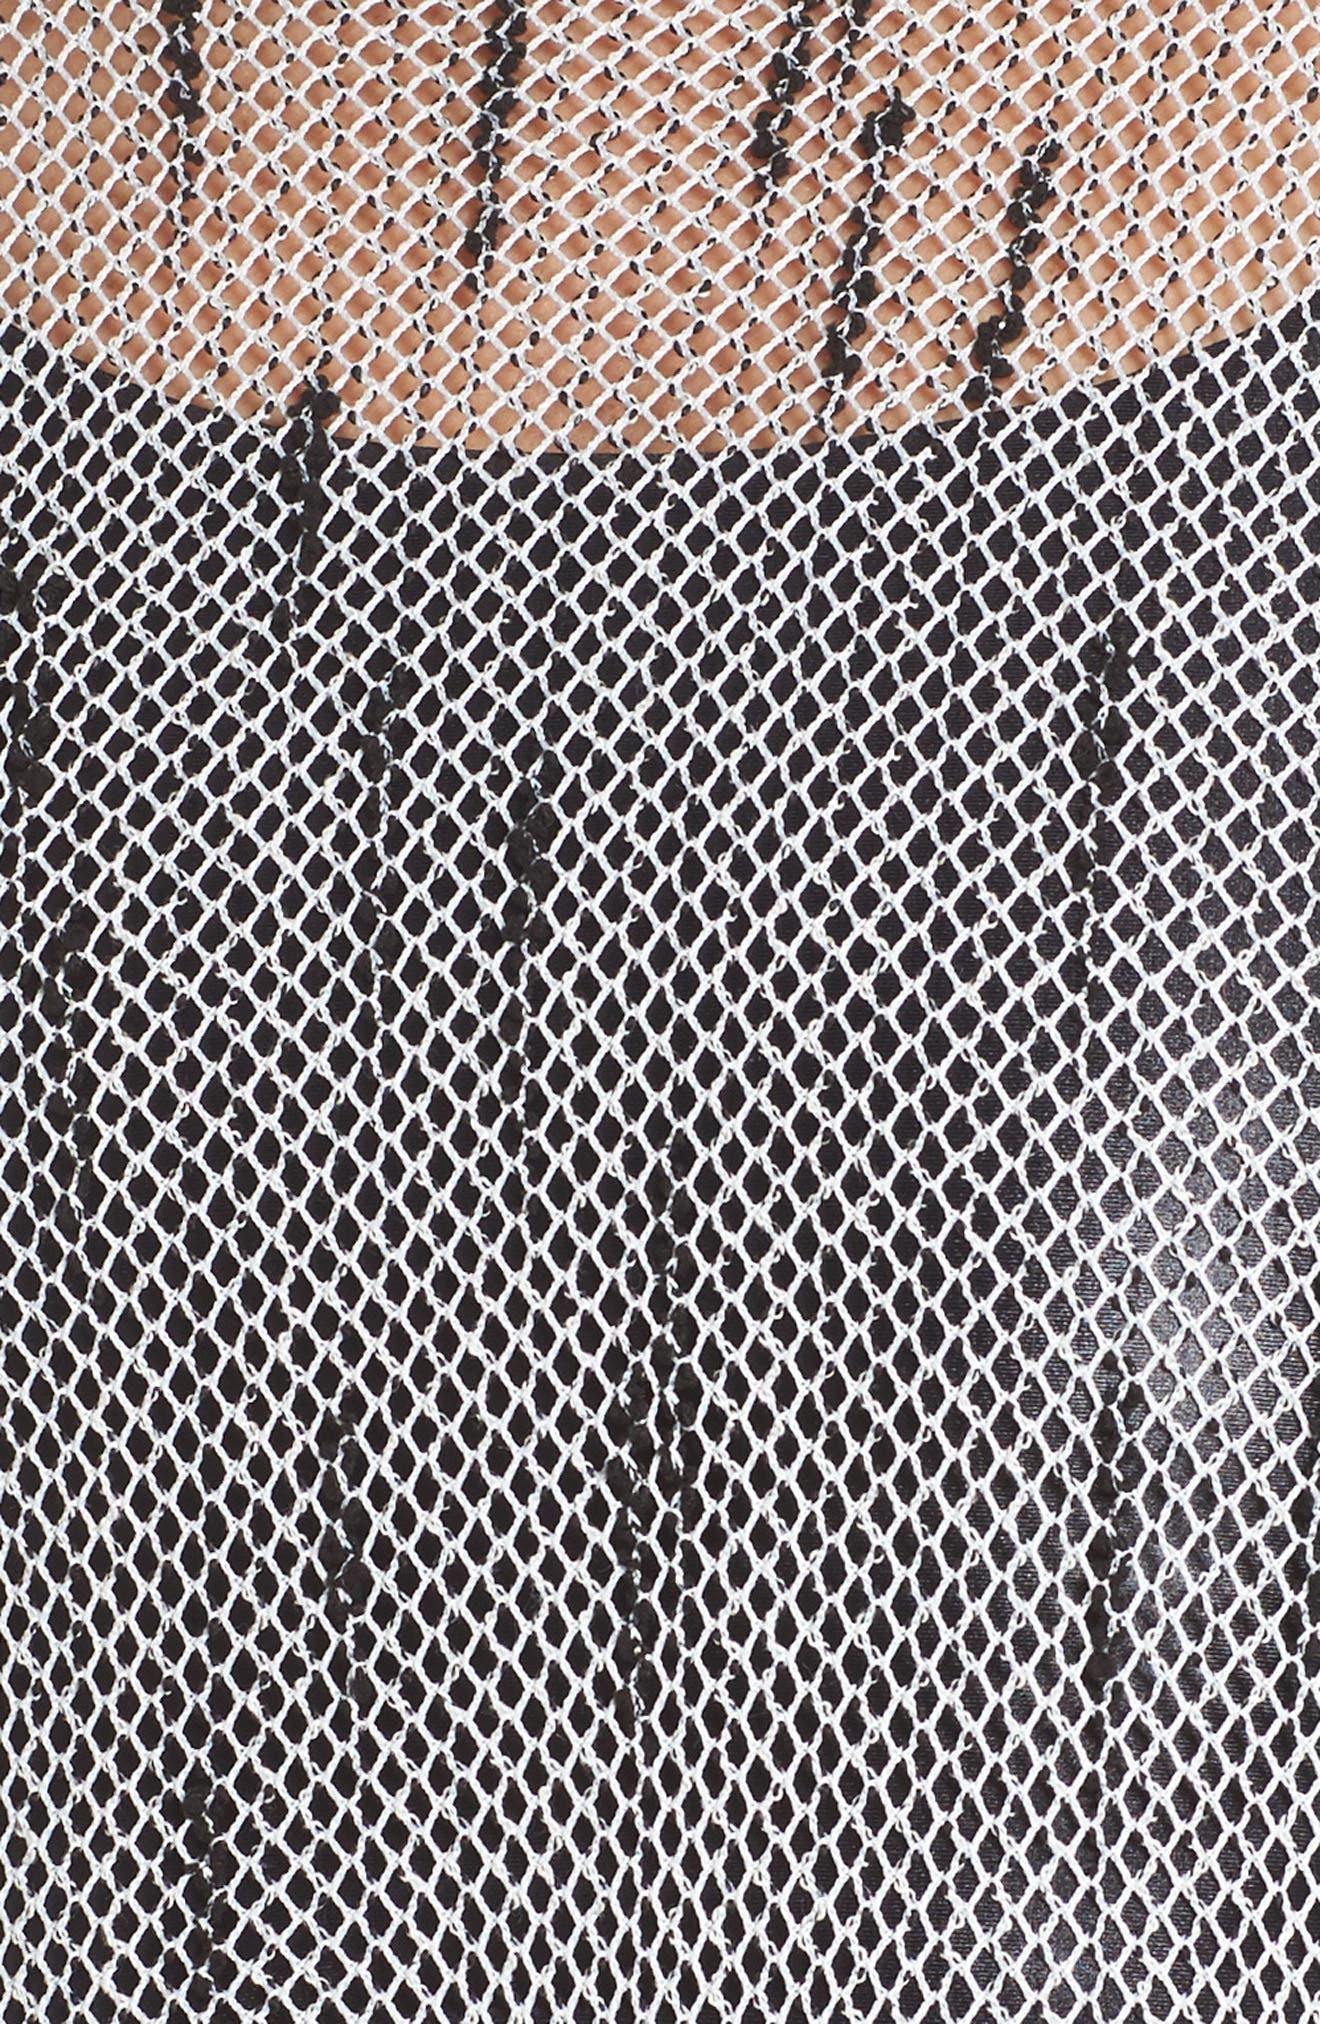 Combination Sports Bra,                             Alternate thumbnail 9, color,                             Black/ Weave